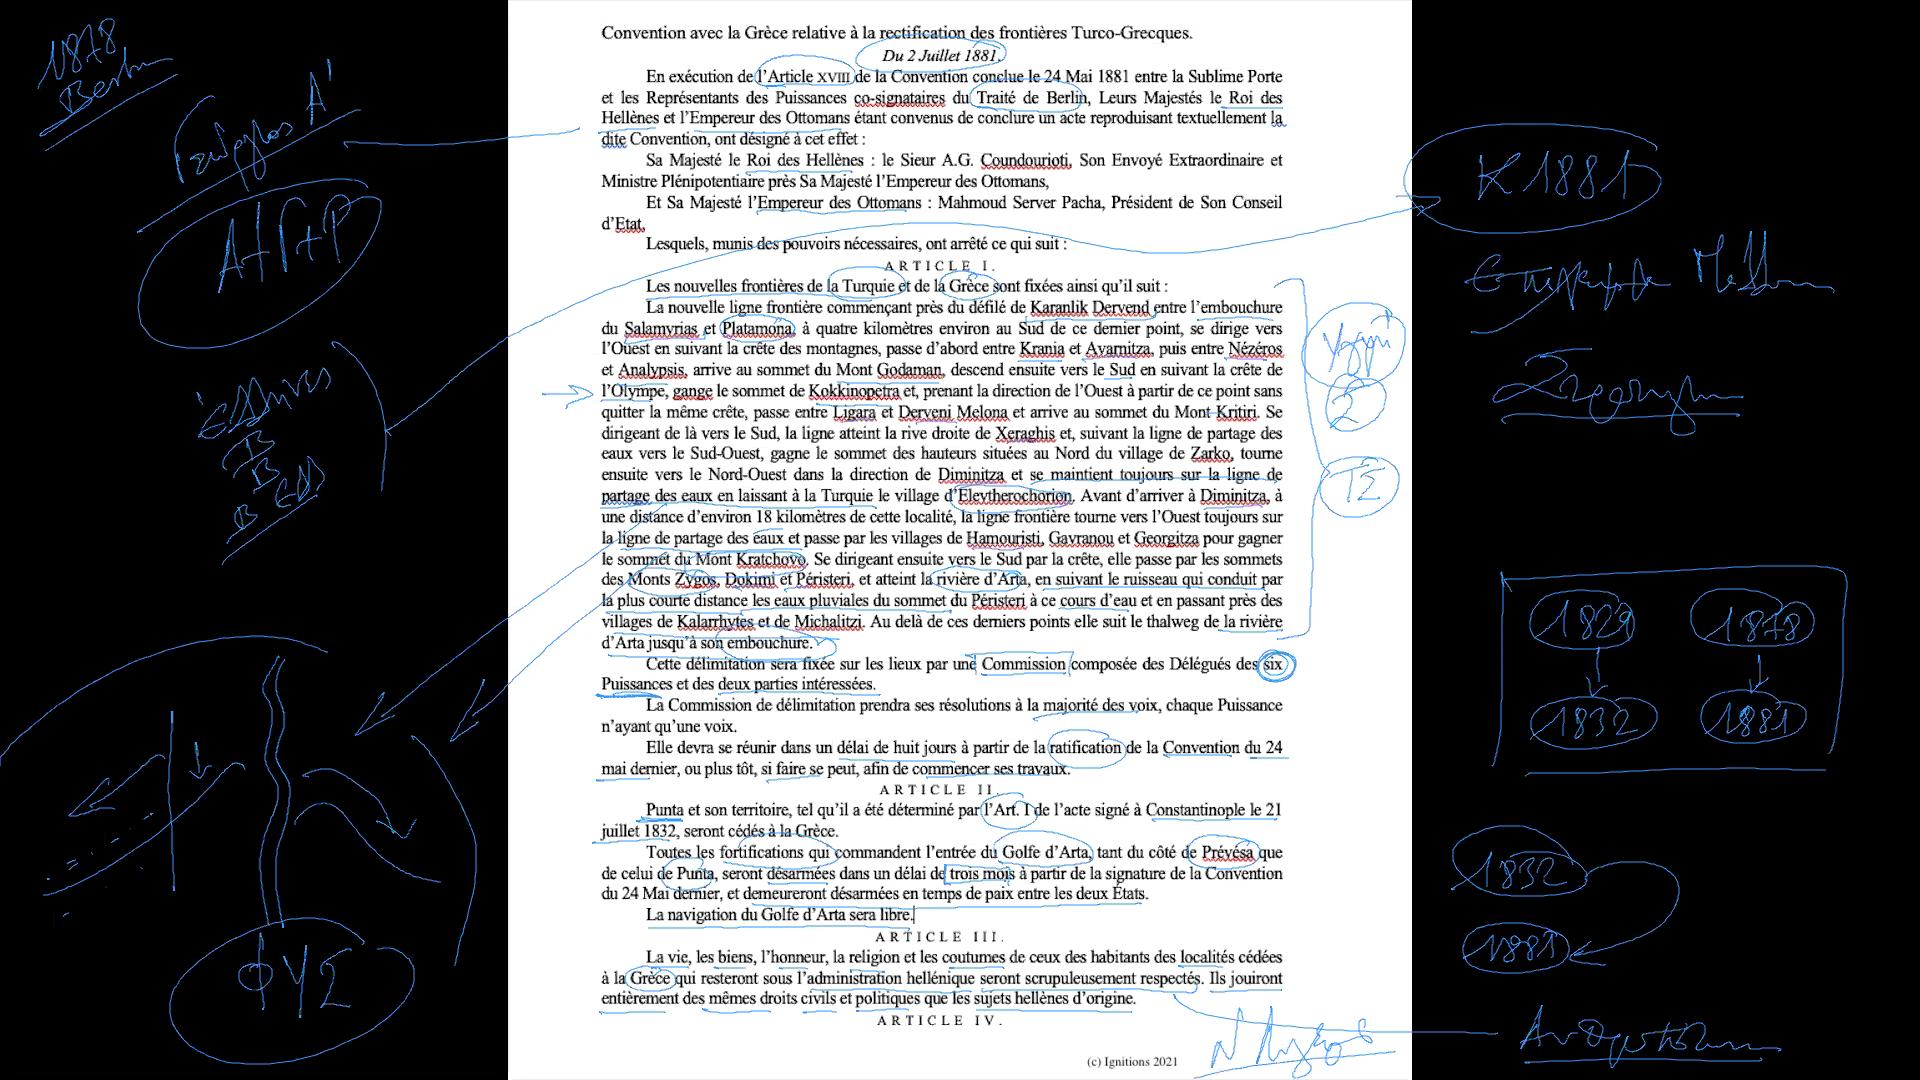 59005 - V -Η συμβολή του Φιλελληνισμού στην στρατηγική θεμελίωση της Ελλάδας. (Dessin)